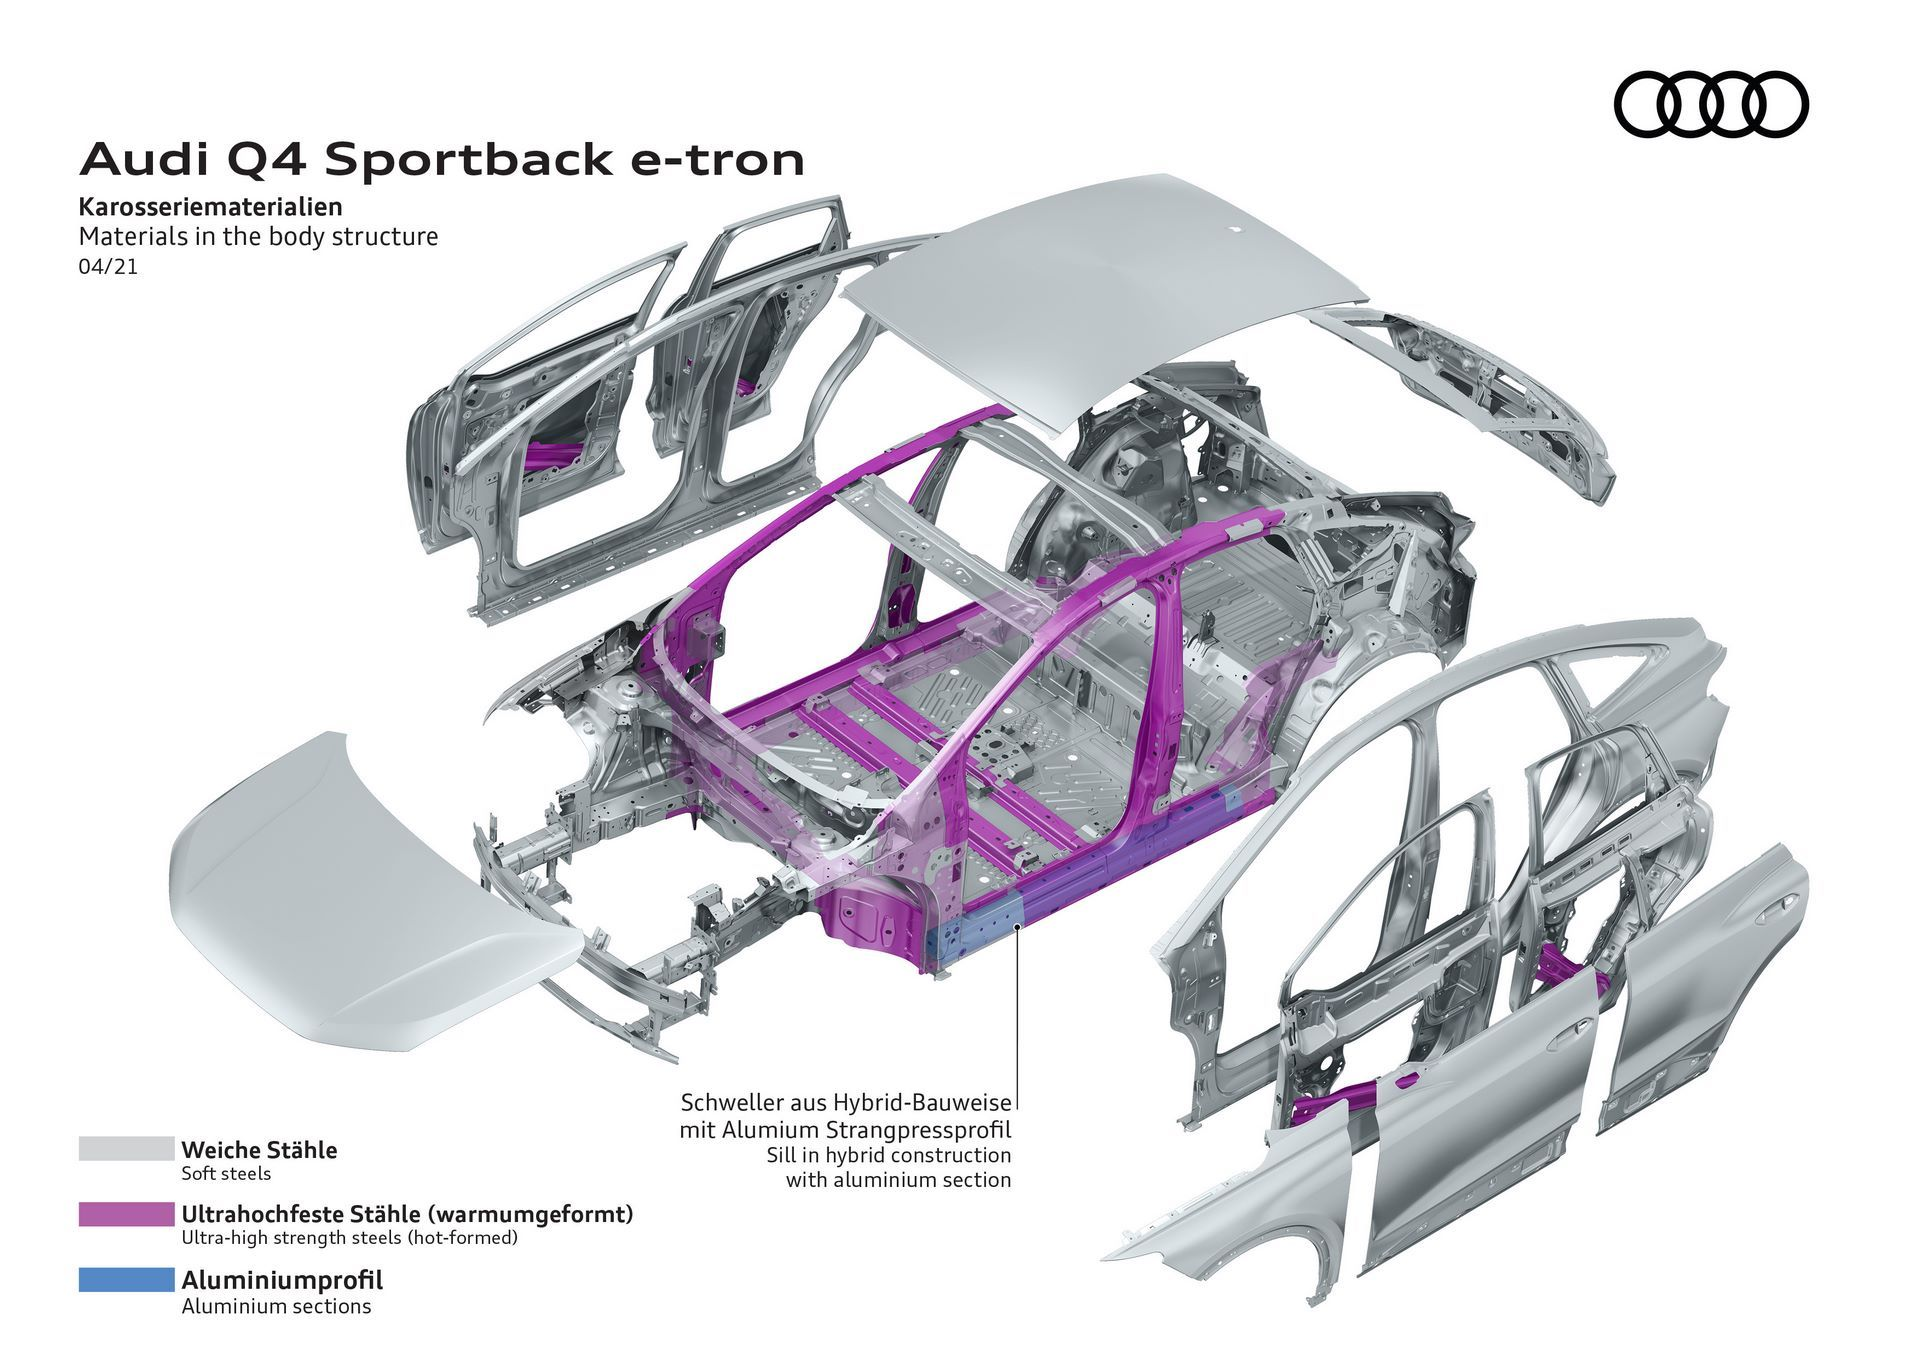 Audi-Q4-e-tron-and-Q4-e-tron-Sportback-155